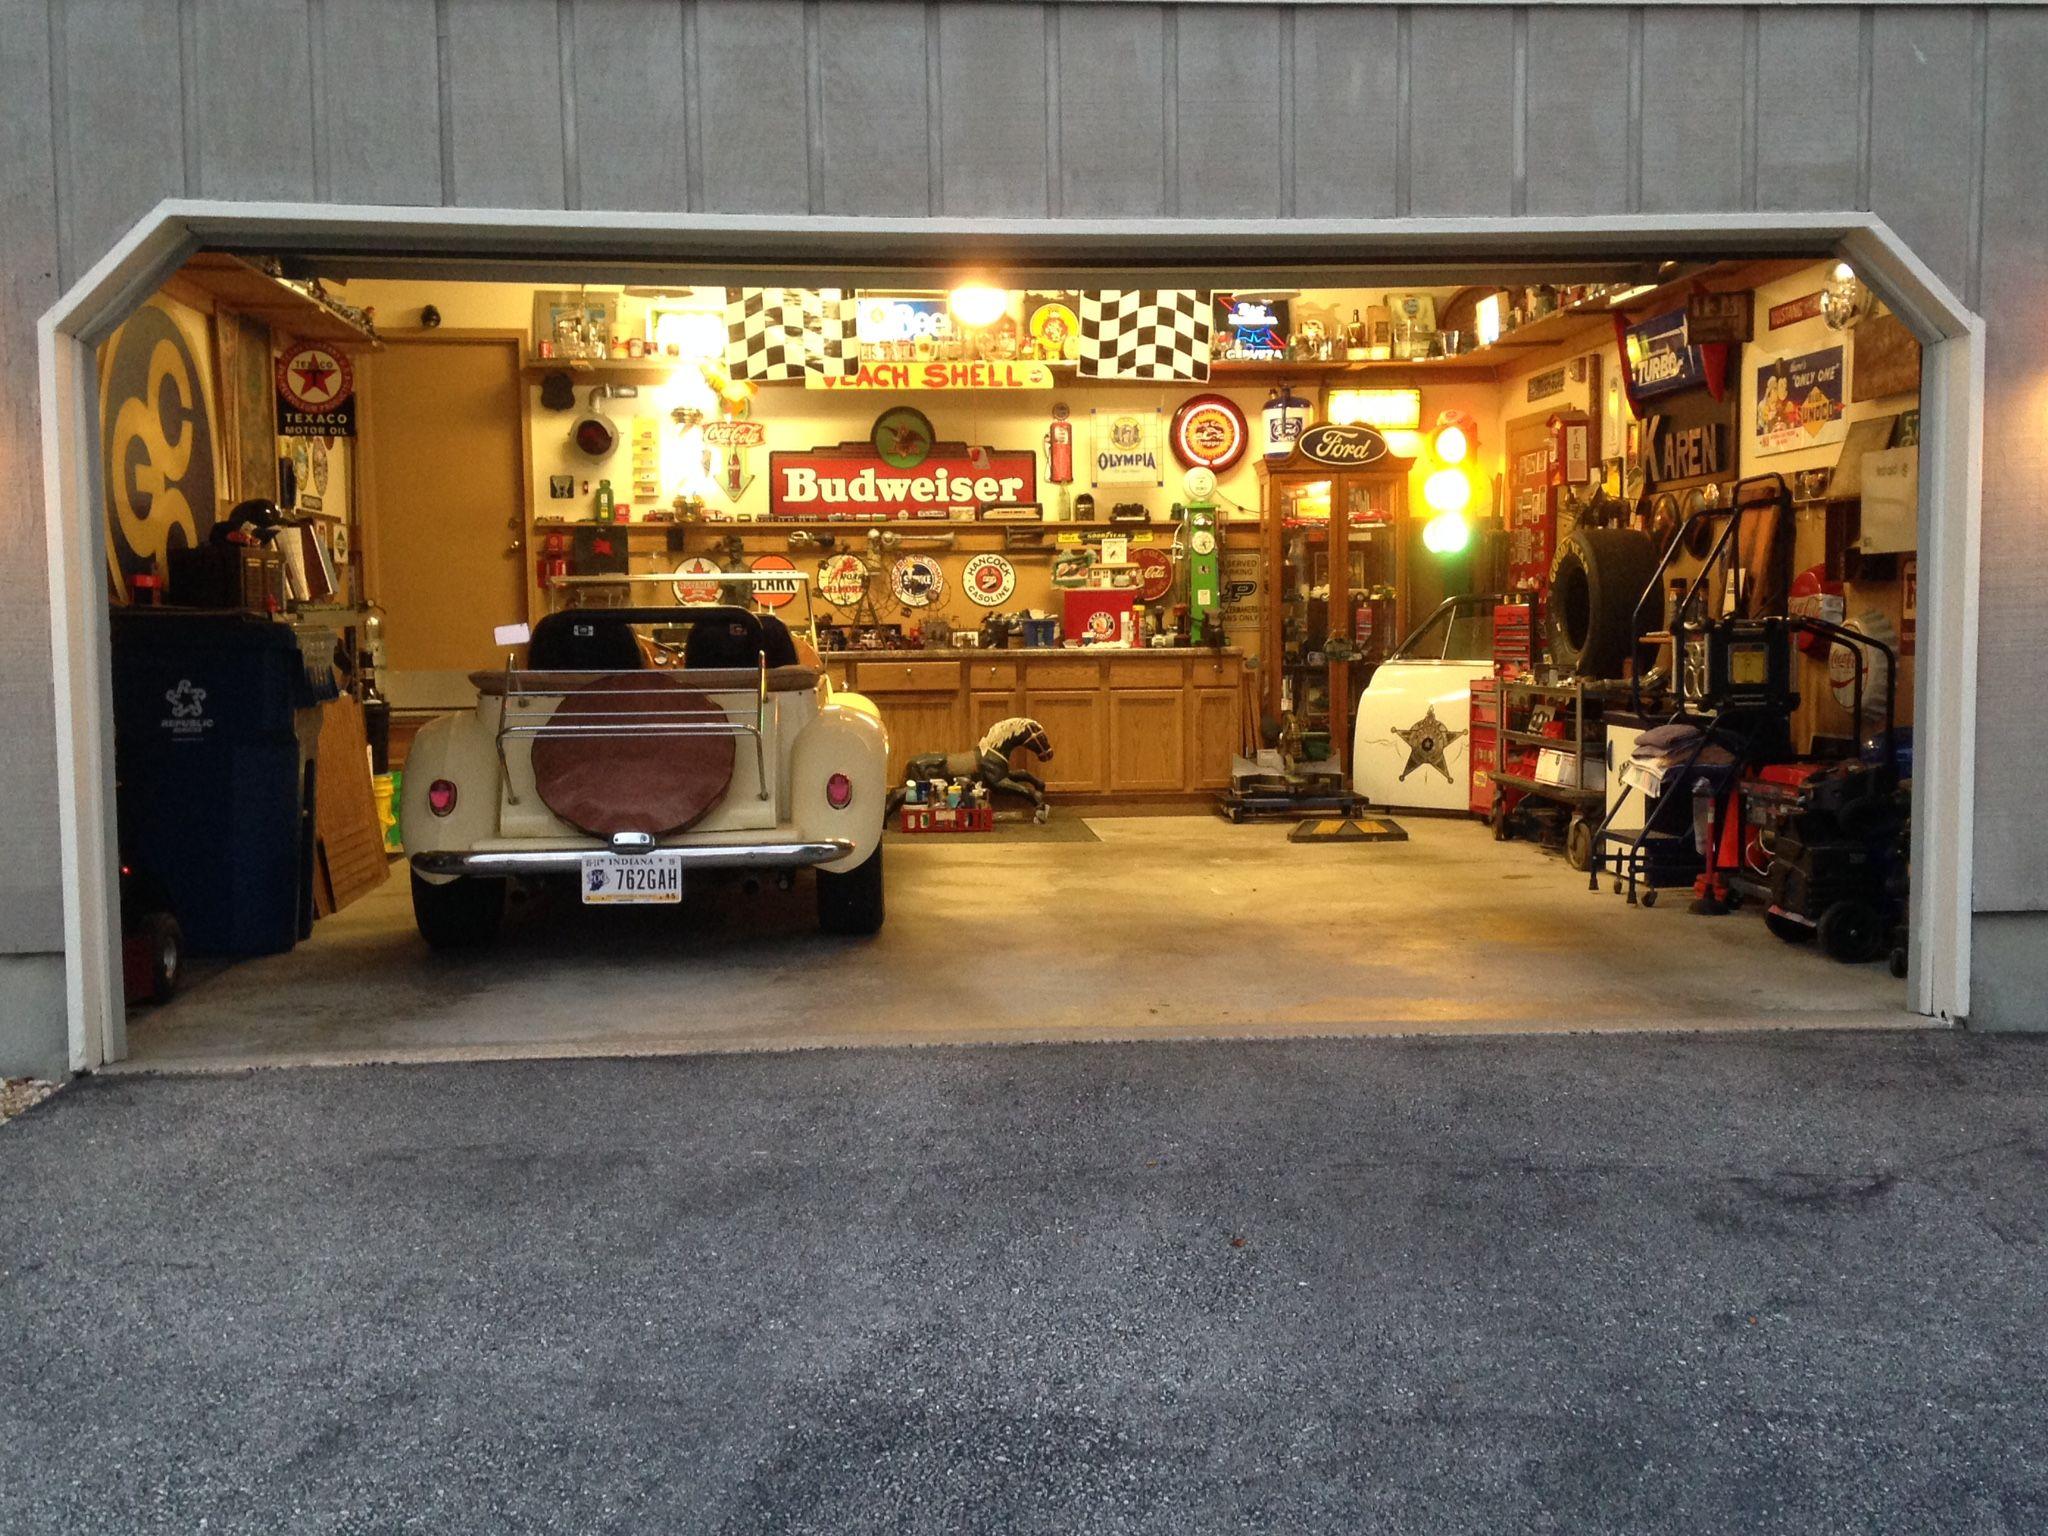 pin by pond hasoy on โรงจอดรถ garage decor barn garage on extraordinary affordable man cave garages ideas plan your dream garage id=16965